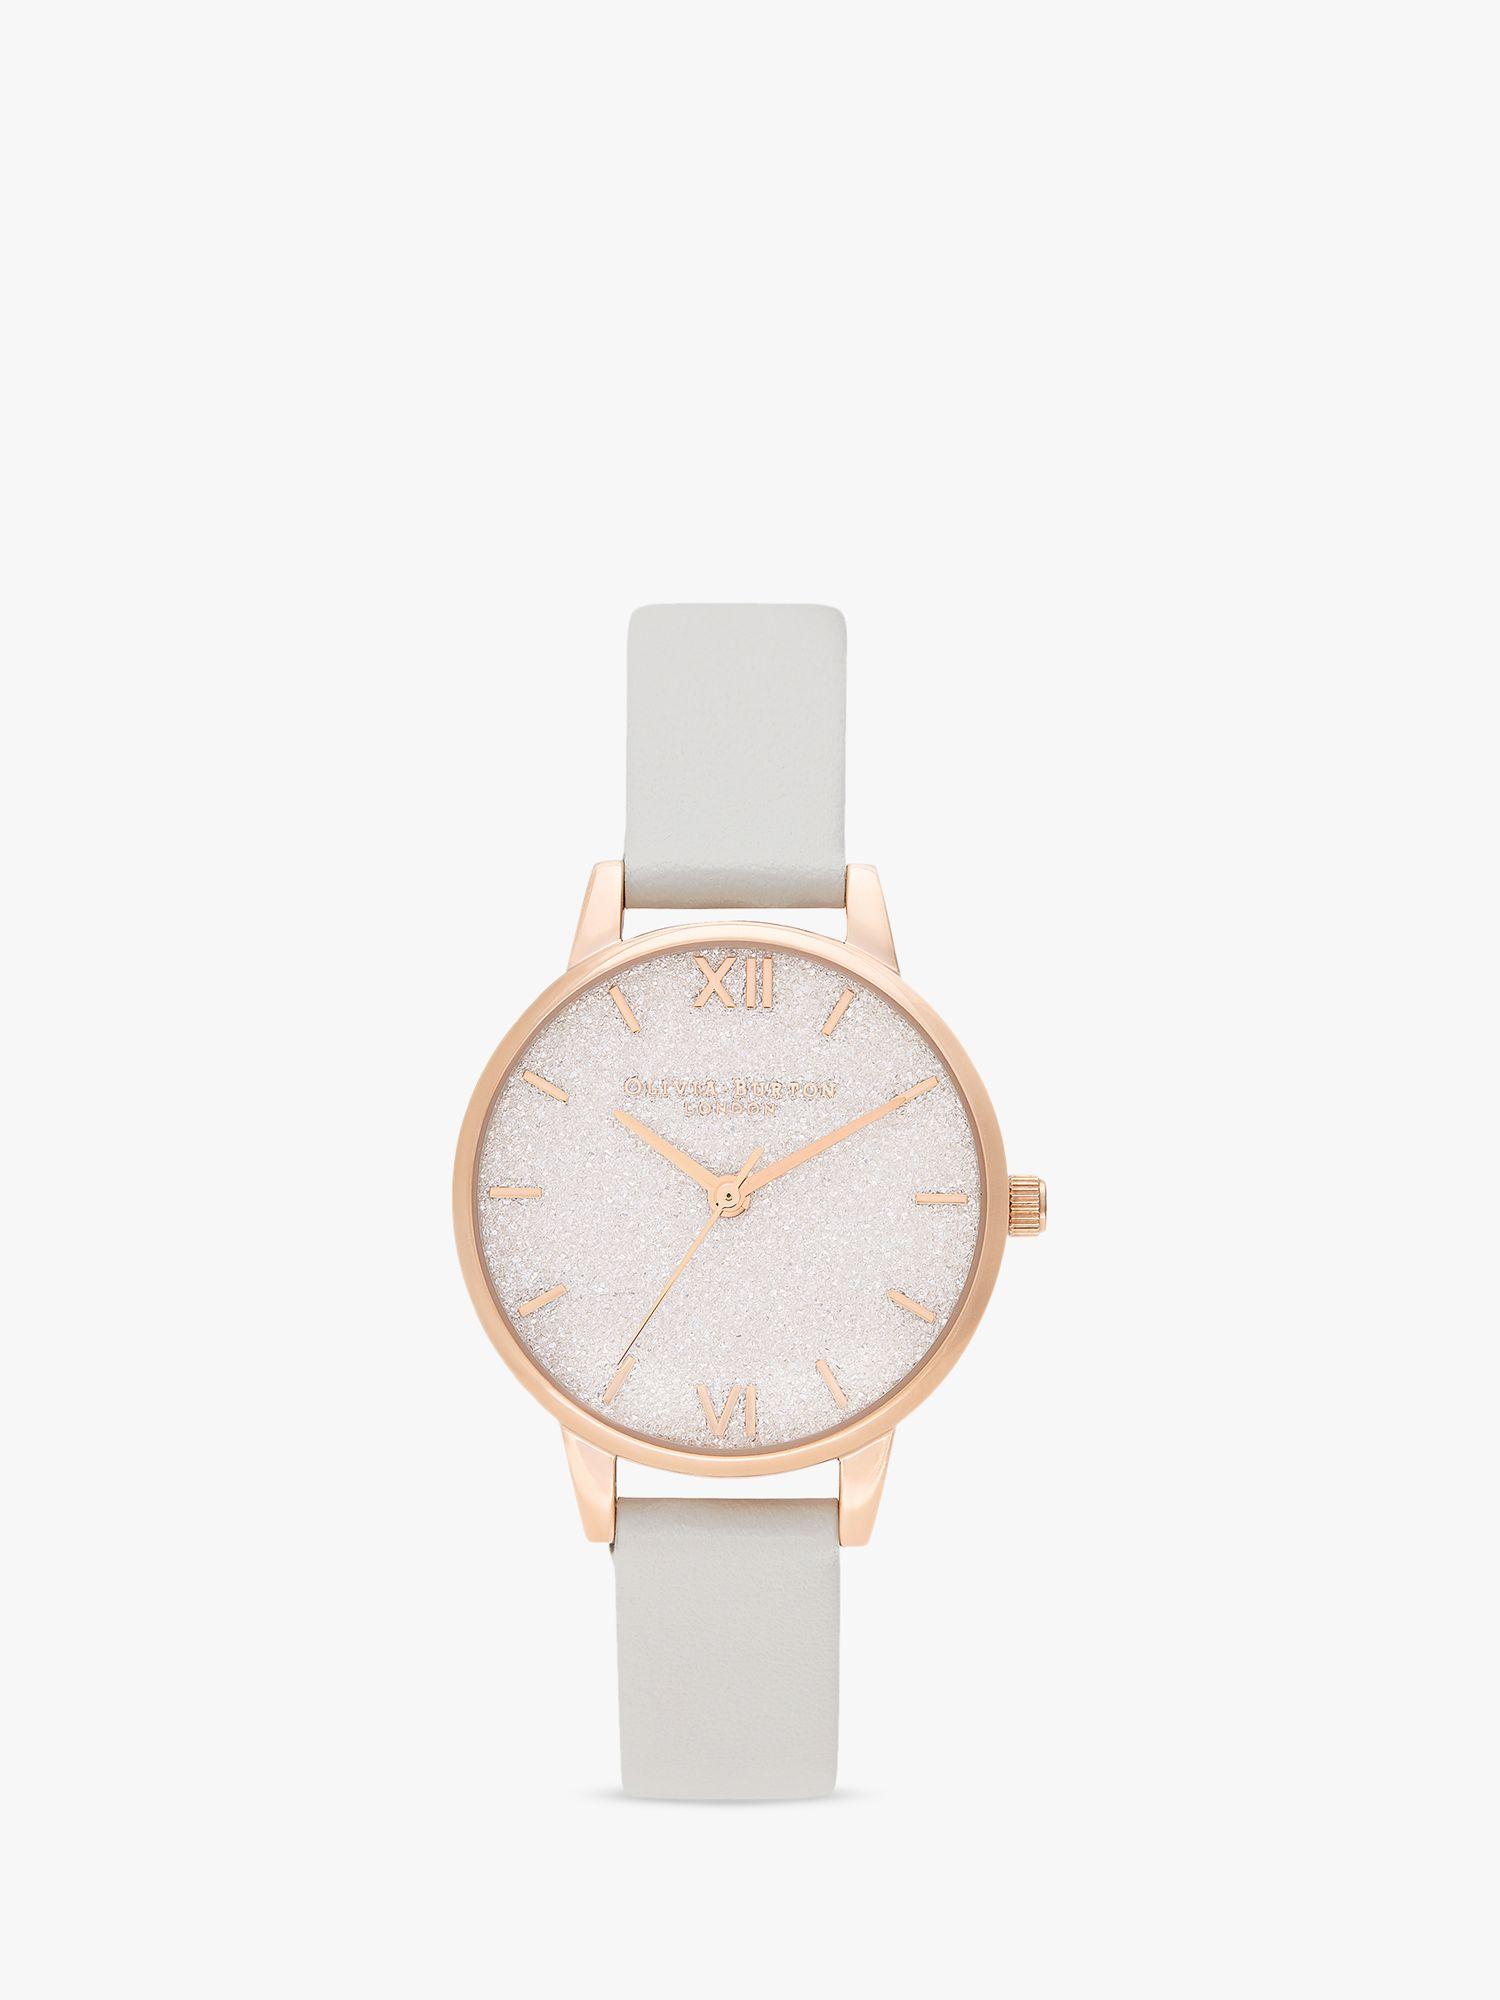 Olivia Burton Olivia Burton OB16GD50 Women's Celestial Faux Leather Strap Watch, Pale Grey/Blush